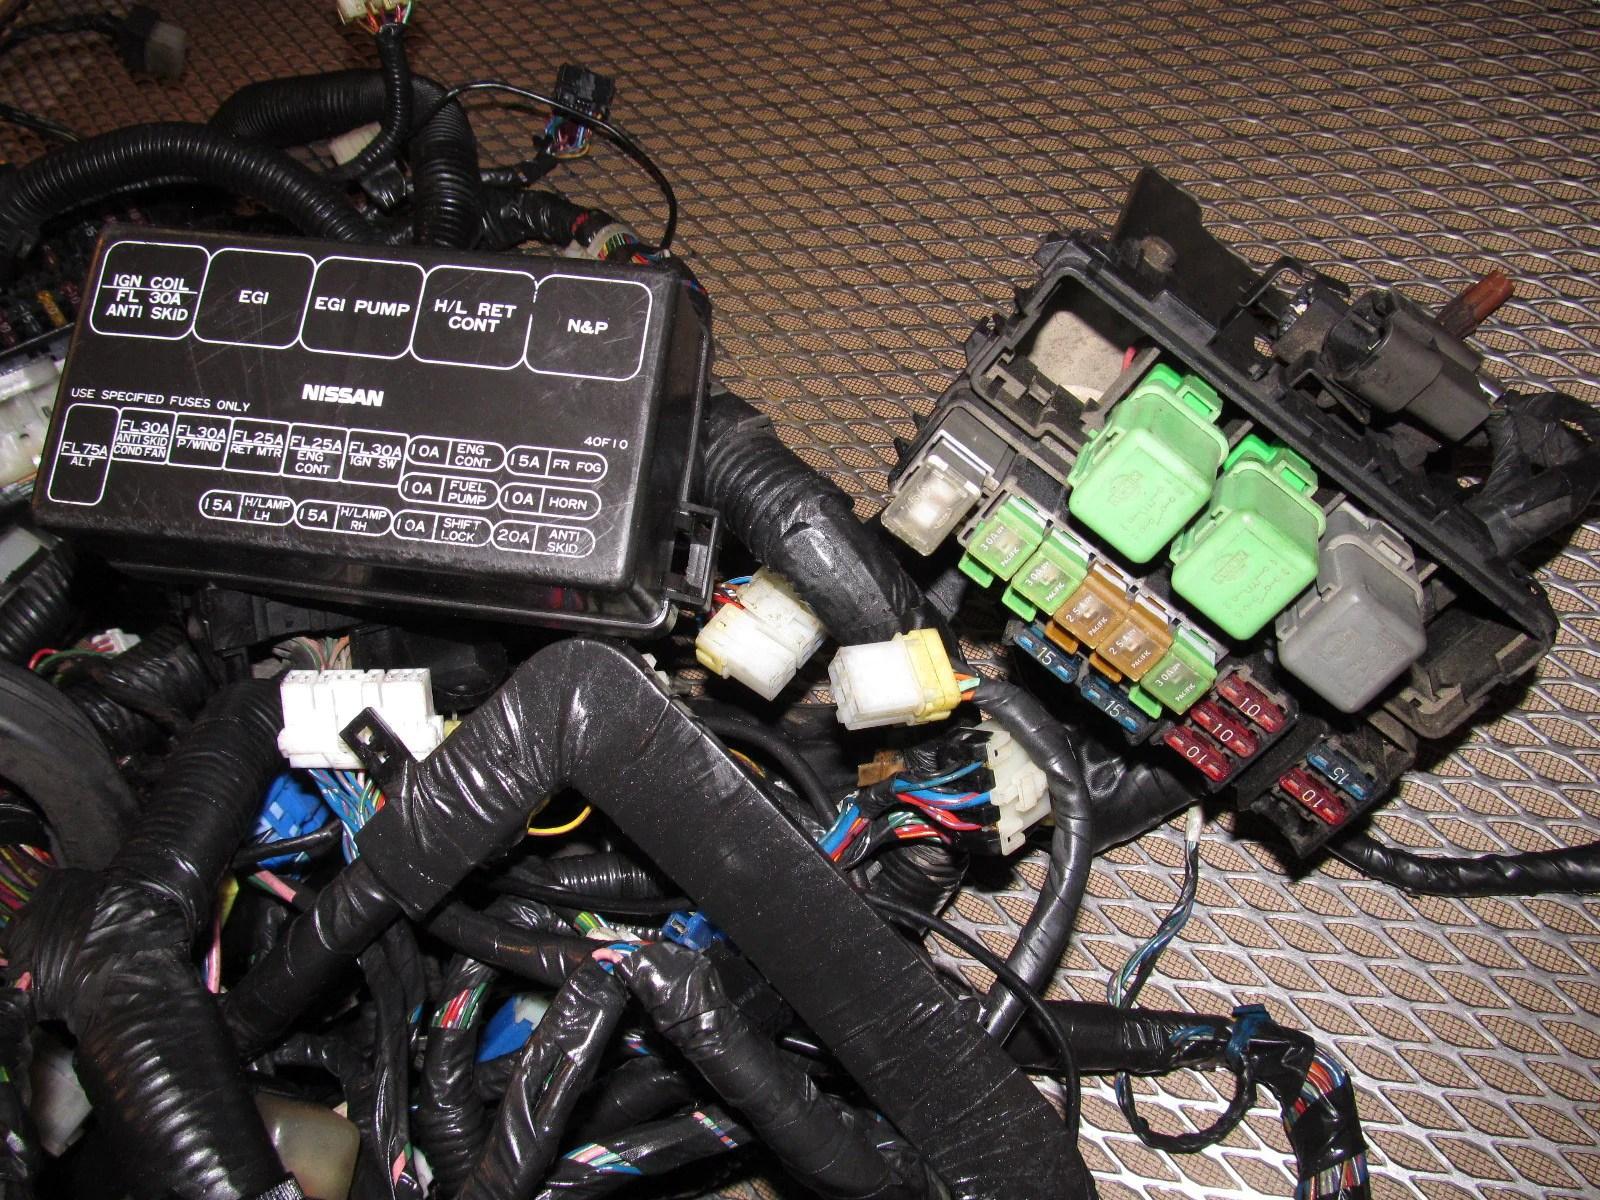 1990 nissan 240sx fuse box wiring diagram name nissan 240sx fuse box relocation 1990 nissan 240sx [ 1600 x 1200 Pixel ]